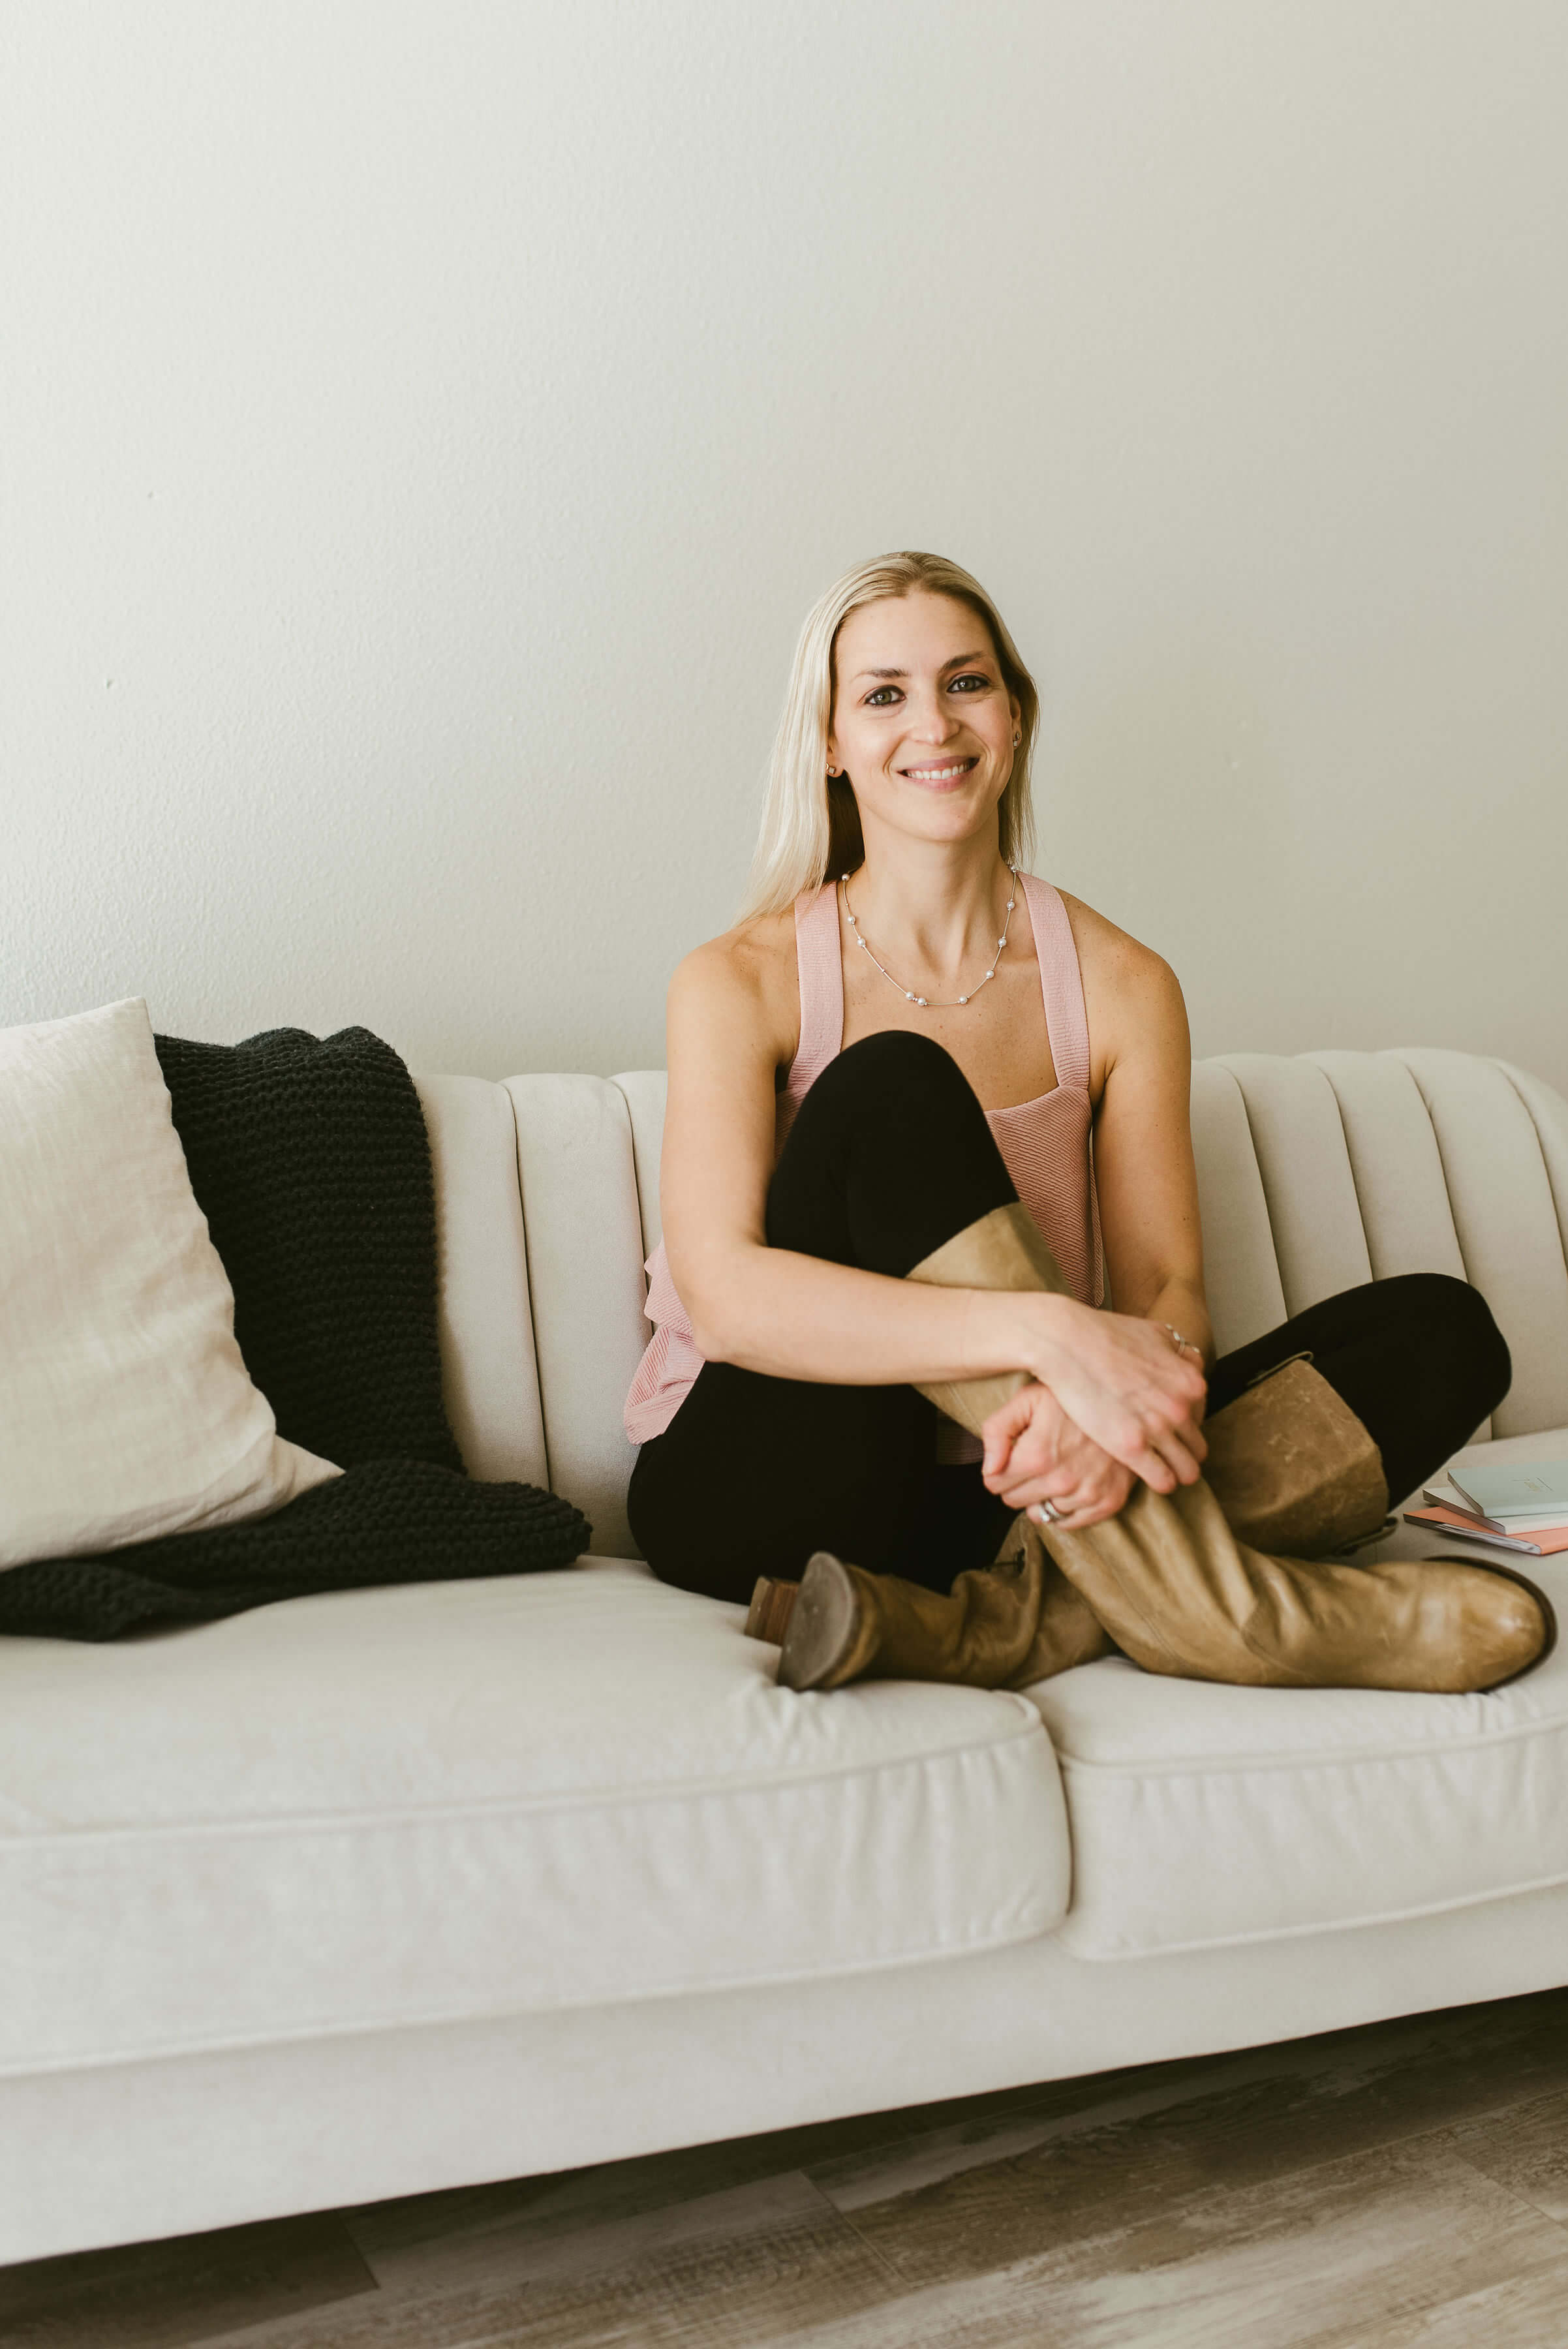 NEDA Sarah Kay Hoffman A Gutsy Girl agutsygirl.com #NEDA #guthealth #agutsygirl #healthyliving